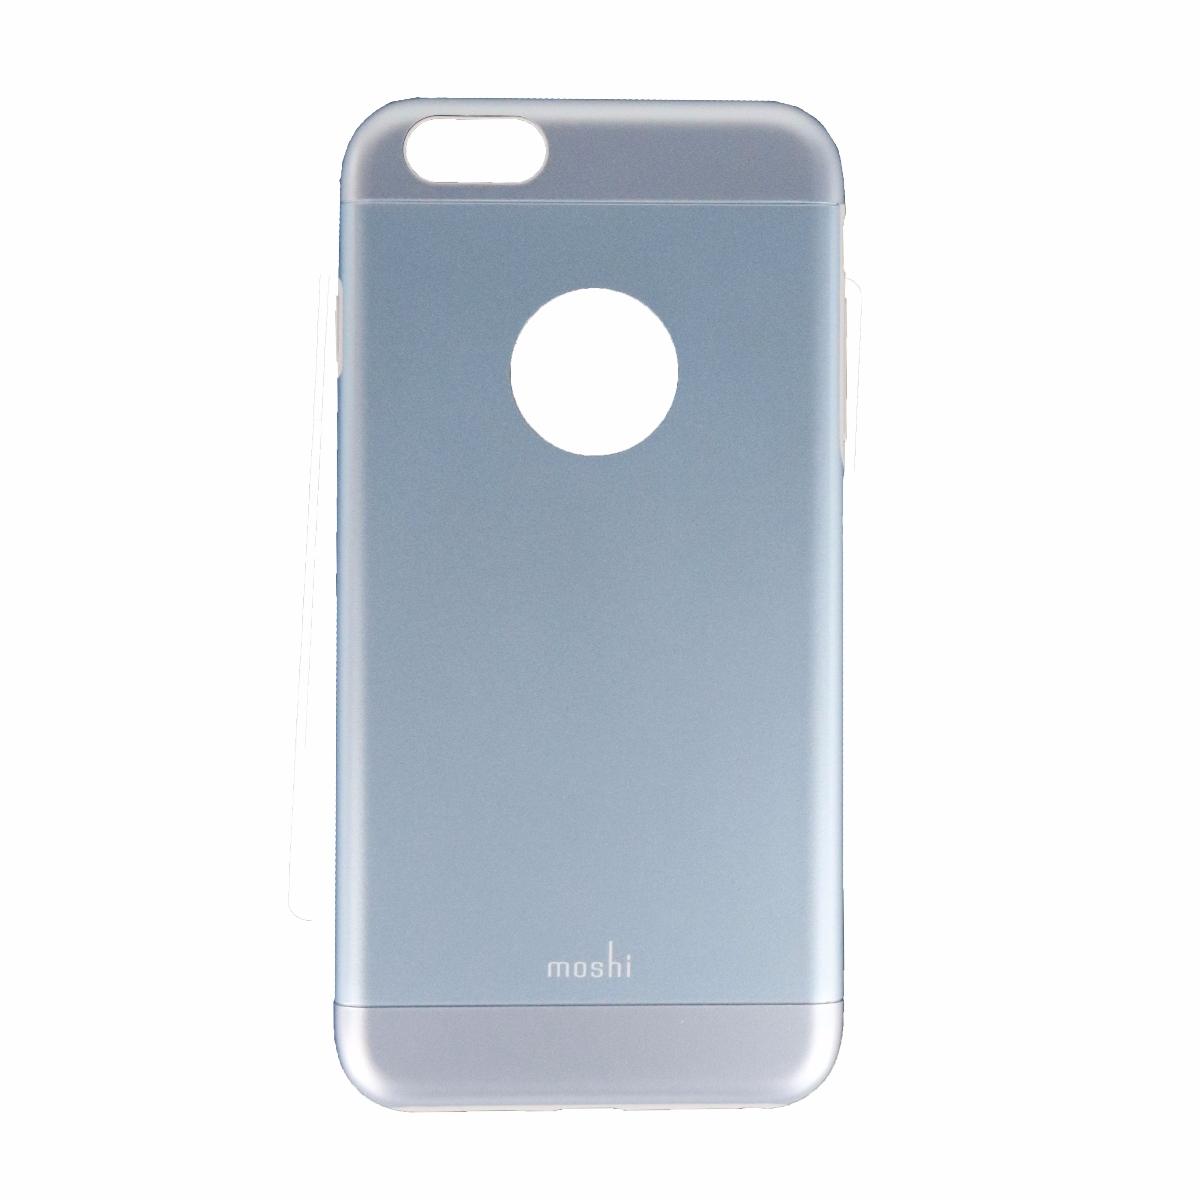 Moshi iGlaze Ultra Slim Protective Case Cover for iPhone 6 Plus/6s Plus - Blue